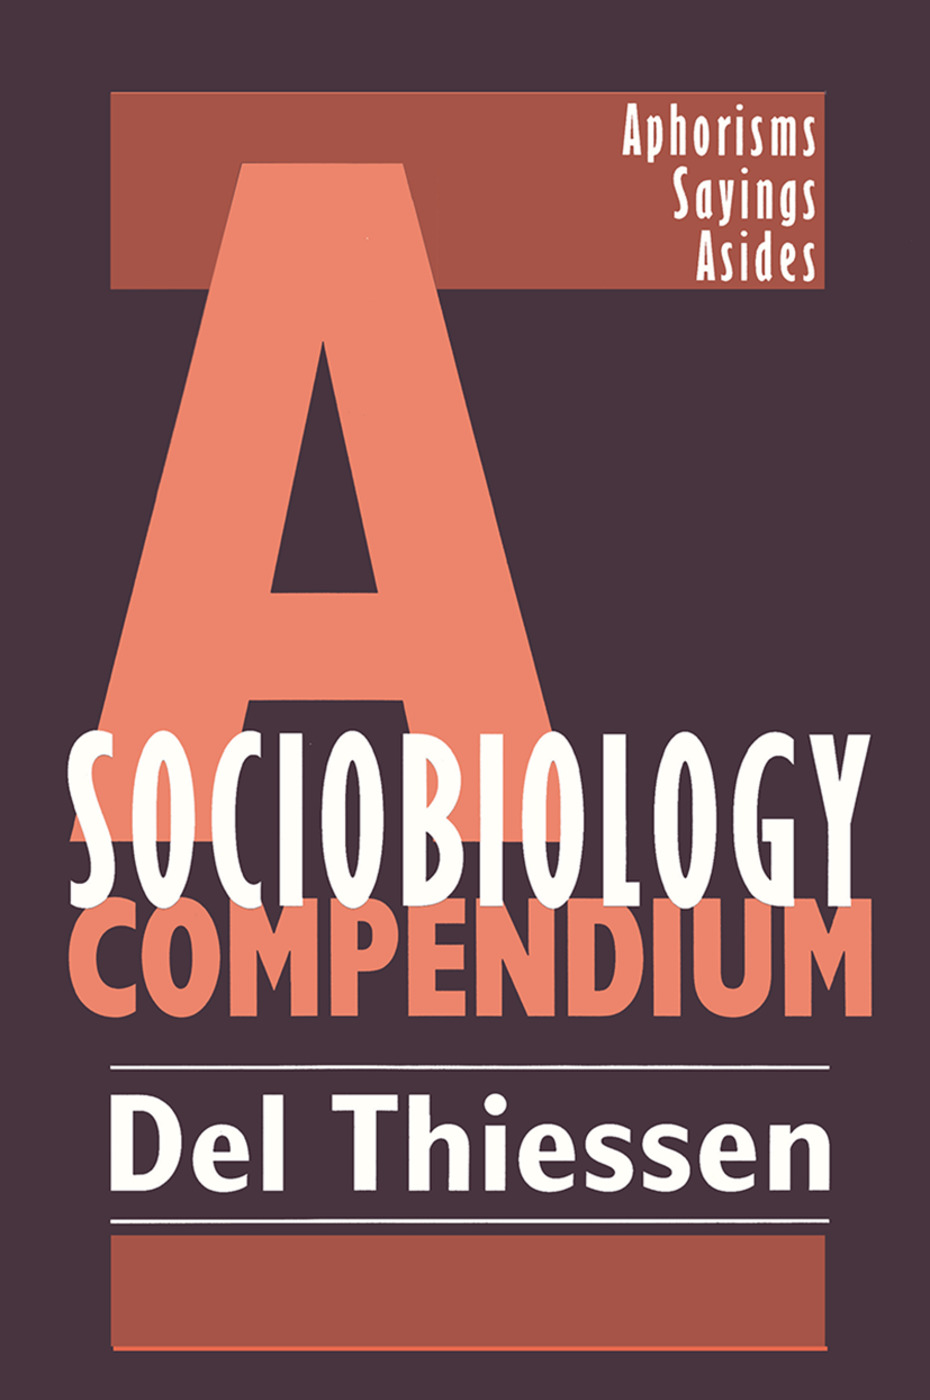 A Sociobiology Compendium